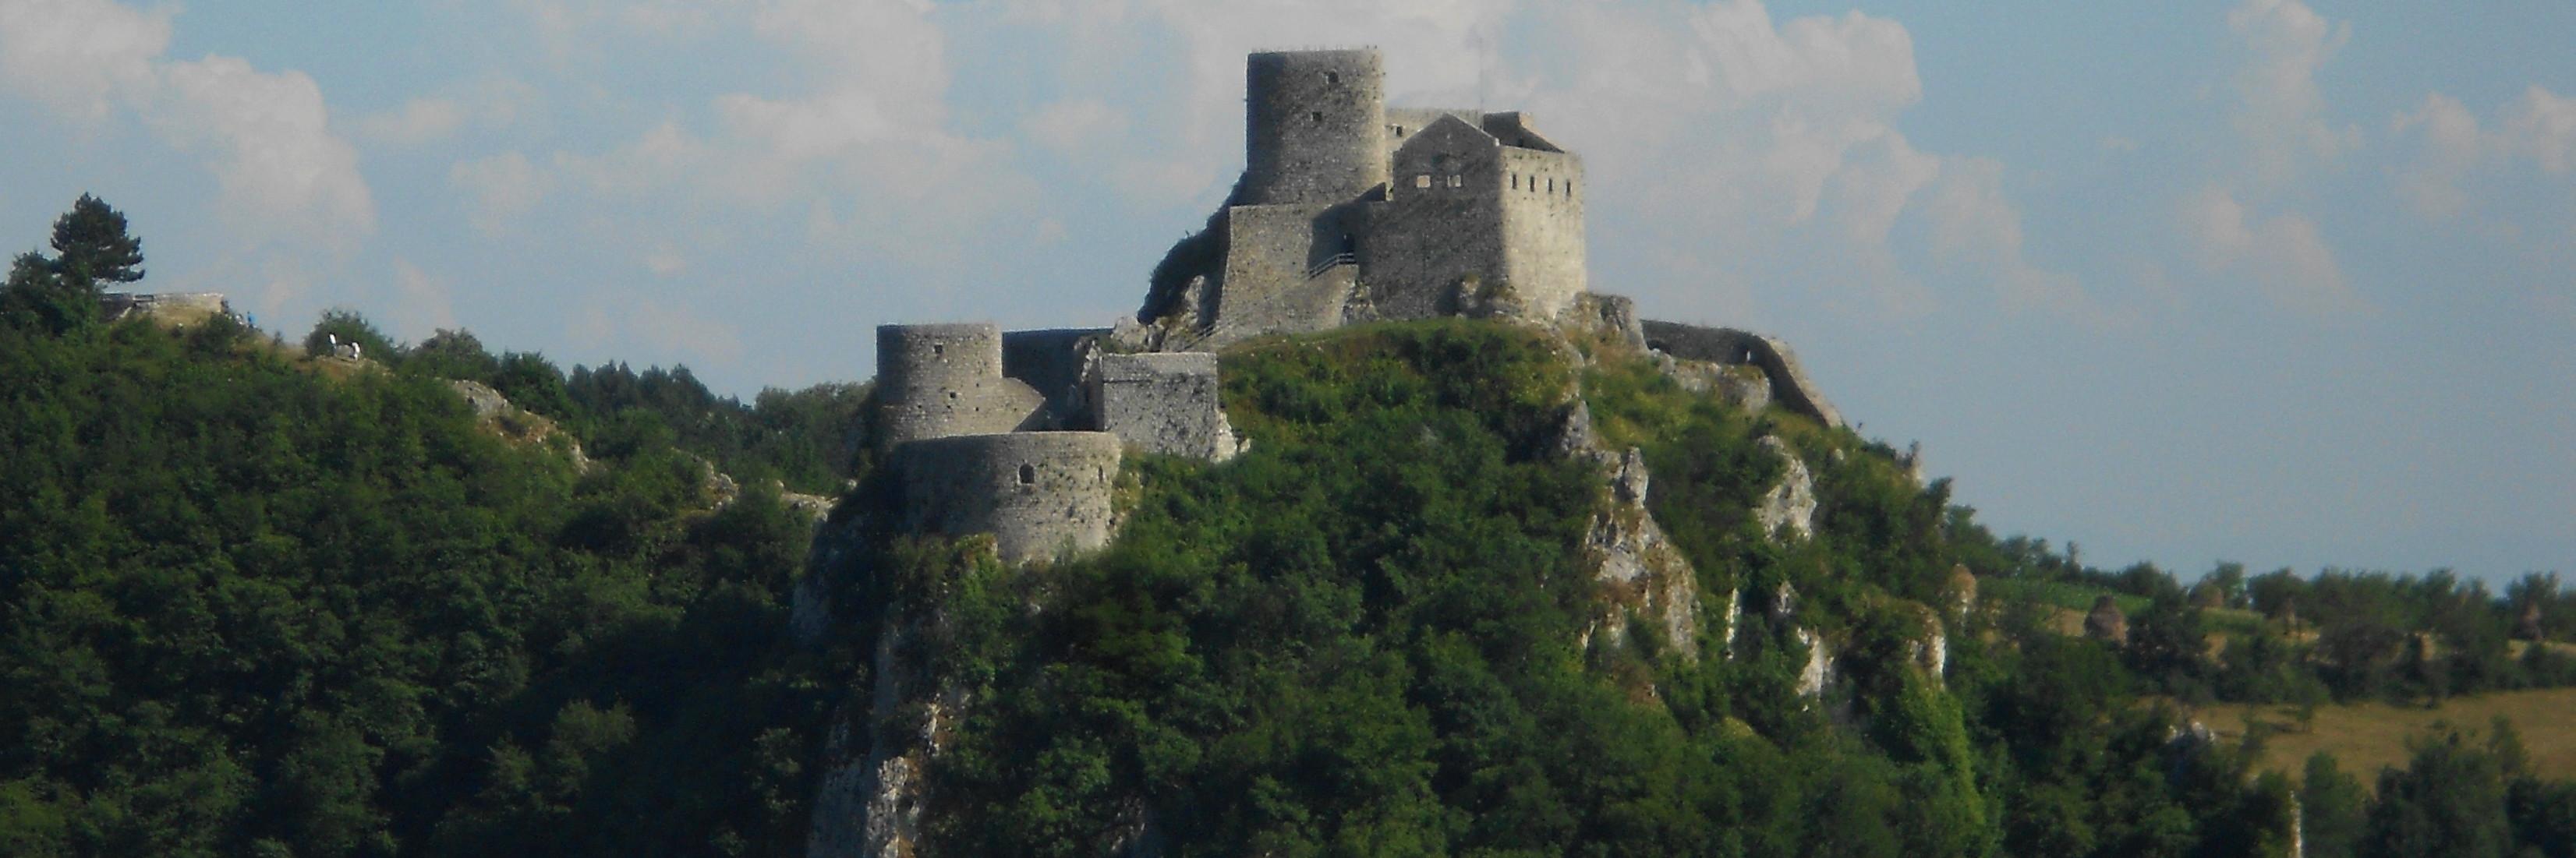 Крепость Сребреник. Фото: Елена Арсениевич, CC BY-SA 3.0